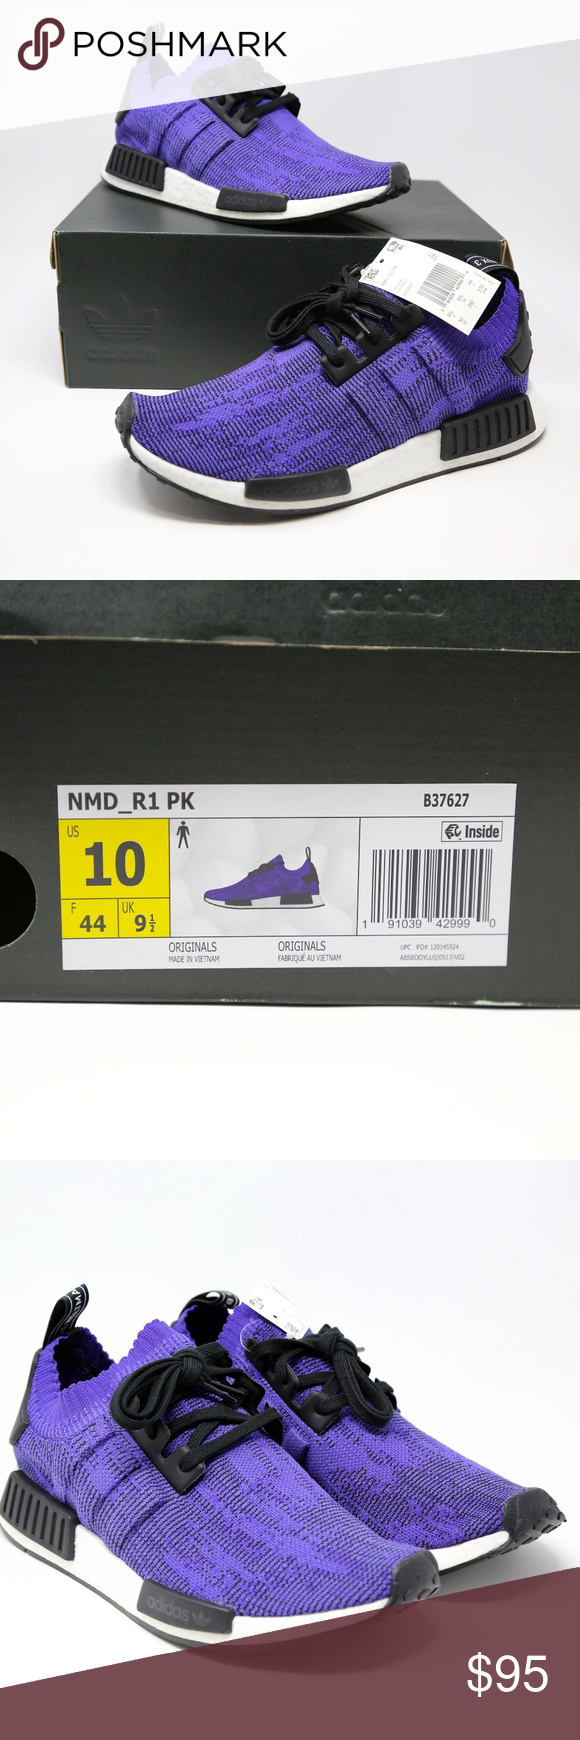 lowest price 51d4c 63bc0 adidas NMD R1 PK Purple Running Shoes Primeknit 10 adidas ...